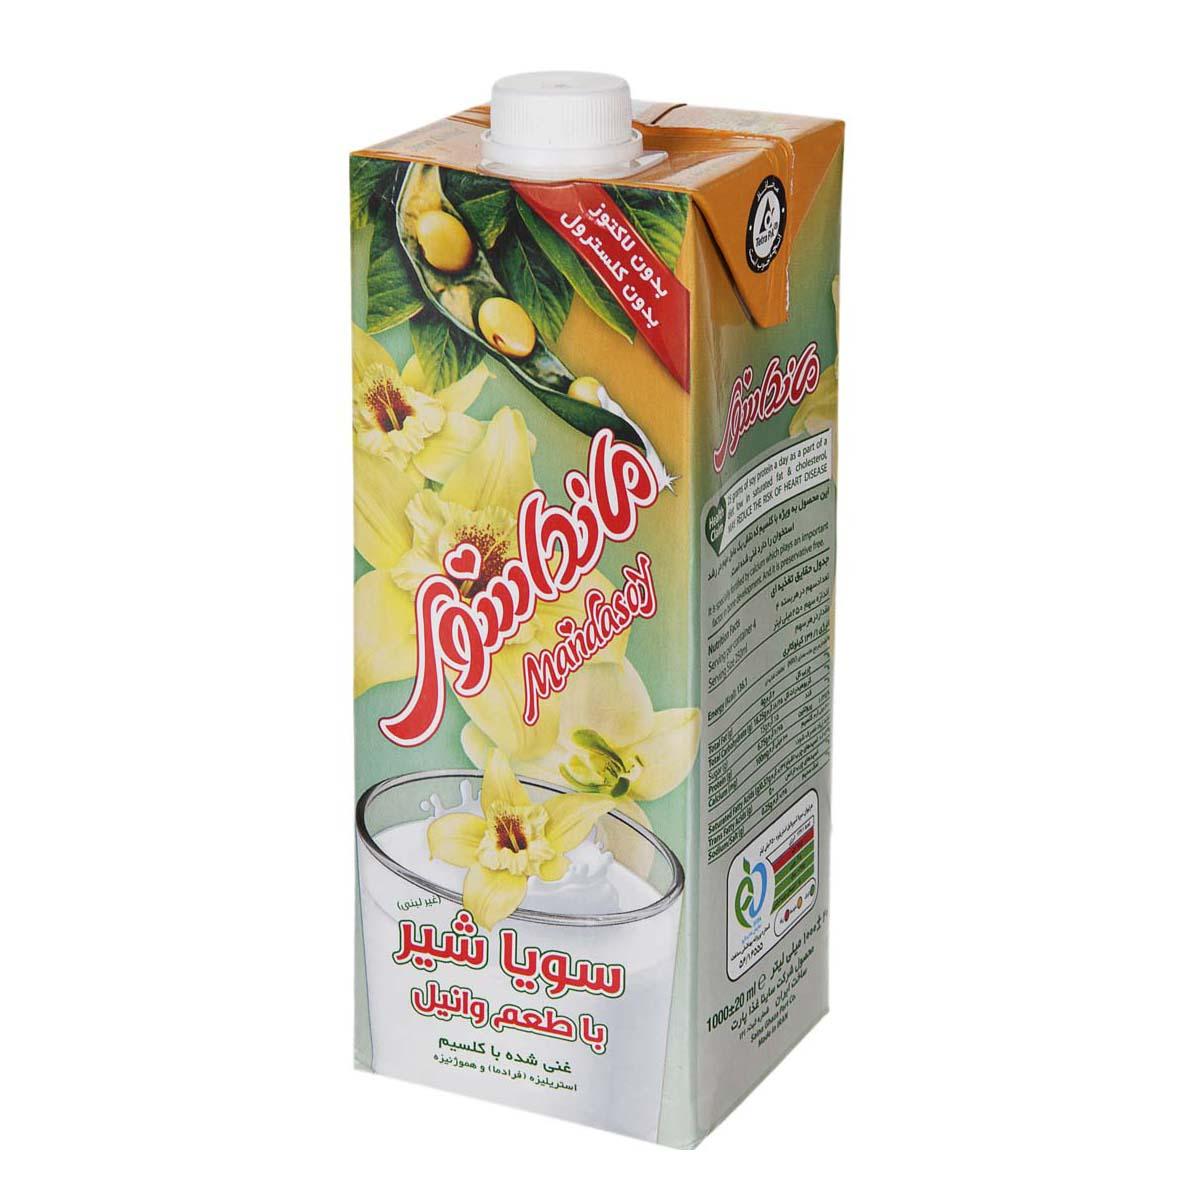 سویا شیر با طعم وانیل مانداسوی- ۲۰۰ میلی لیتر